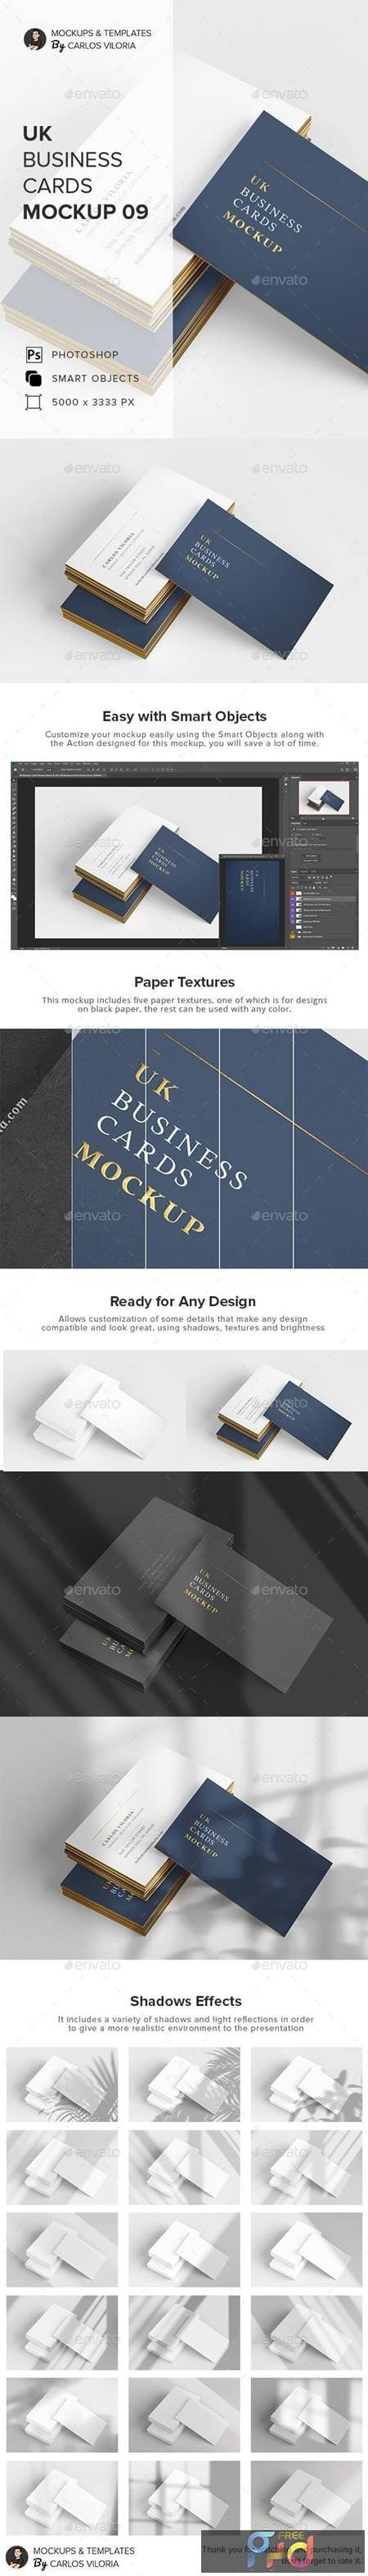 UK Business Cards Mockup 09 27826545 1